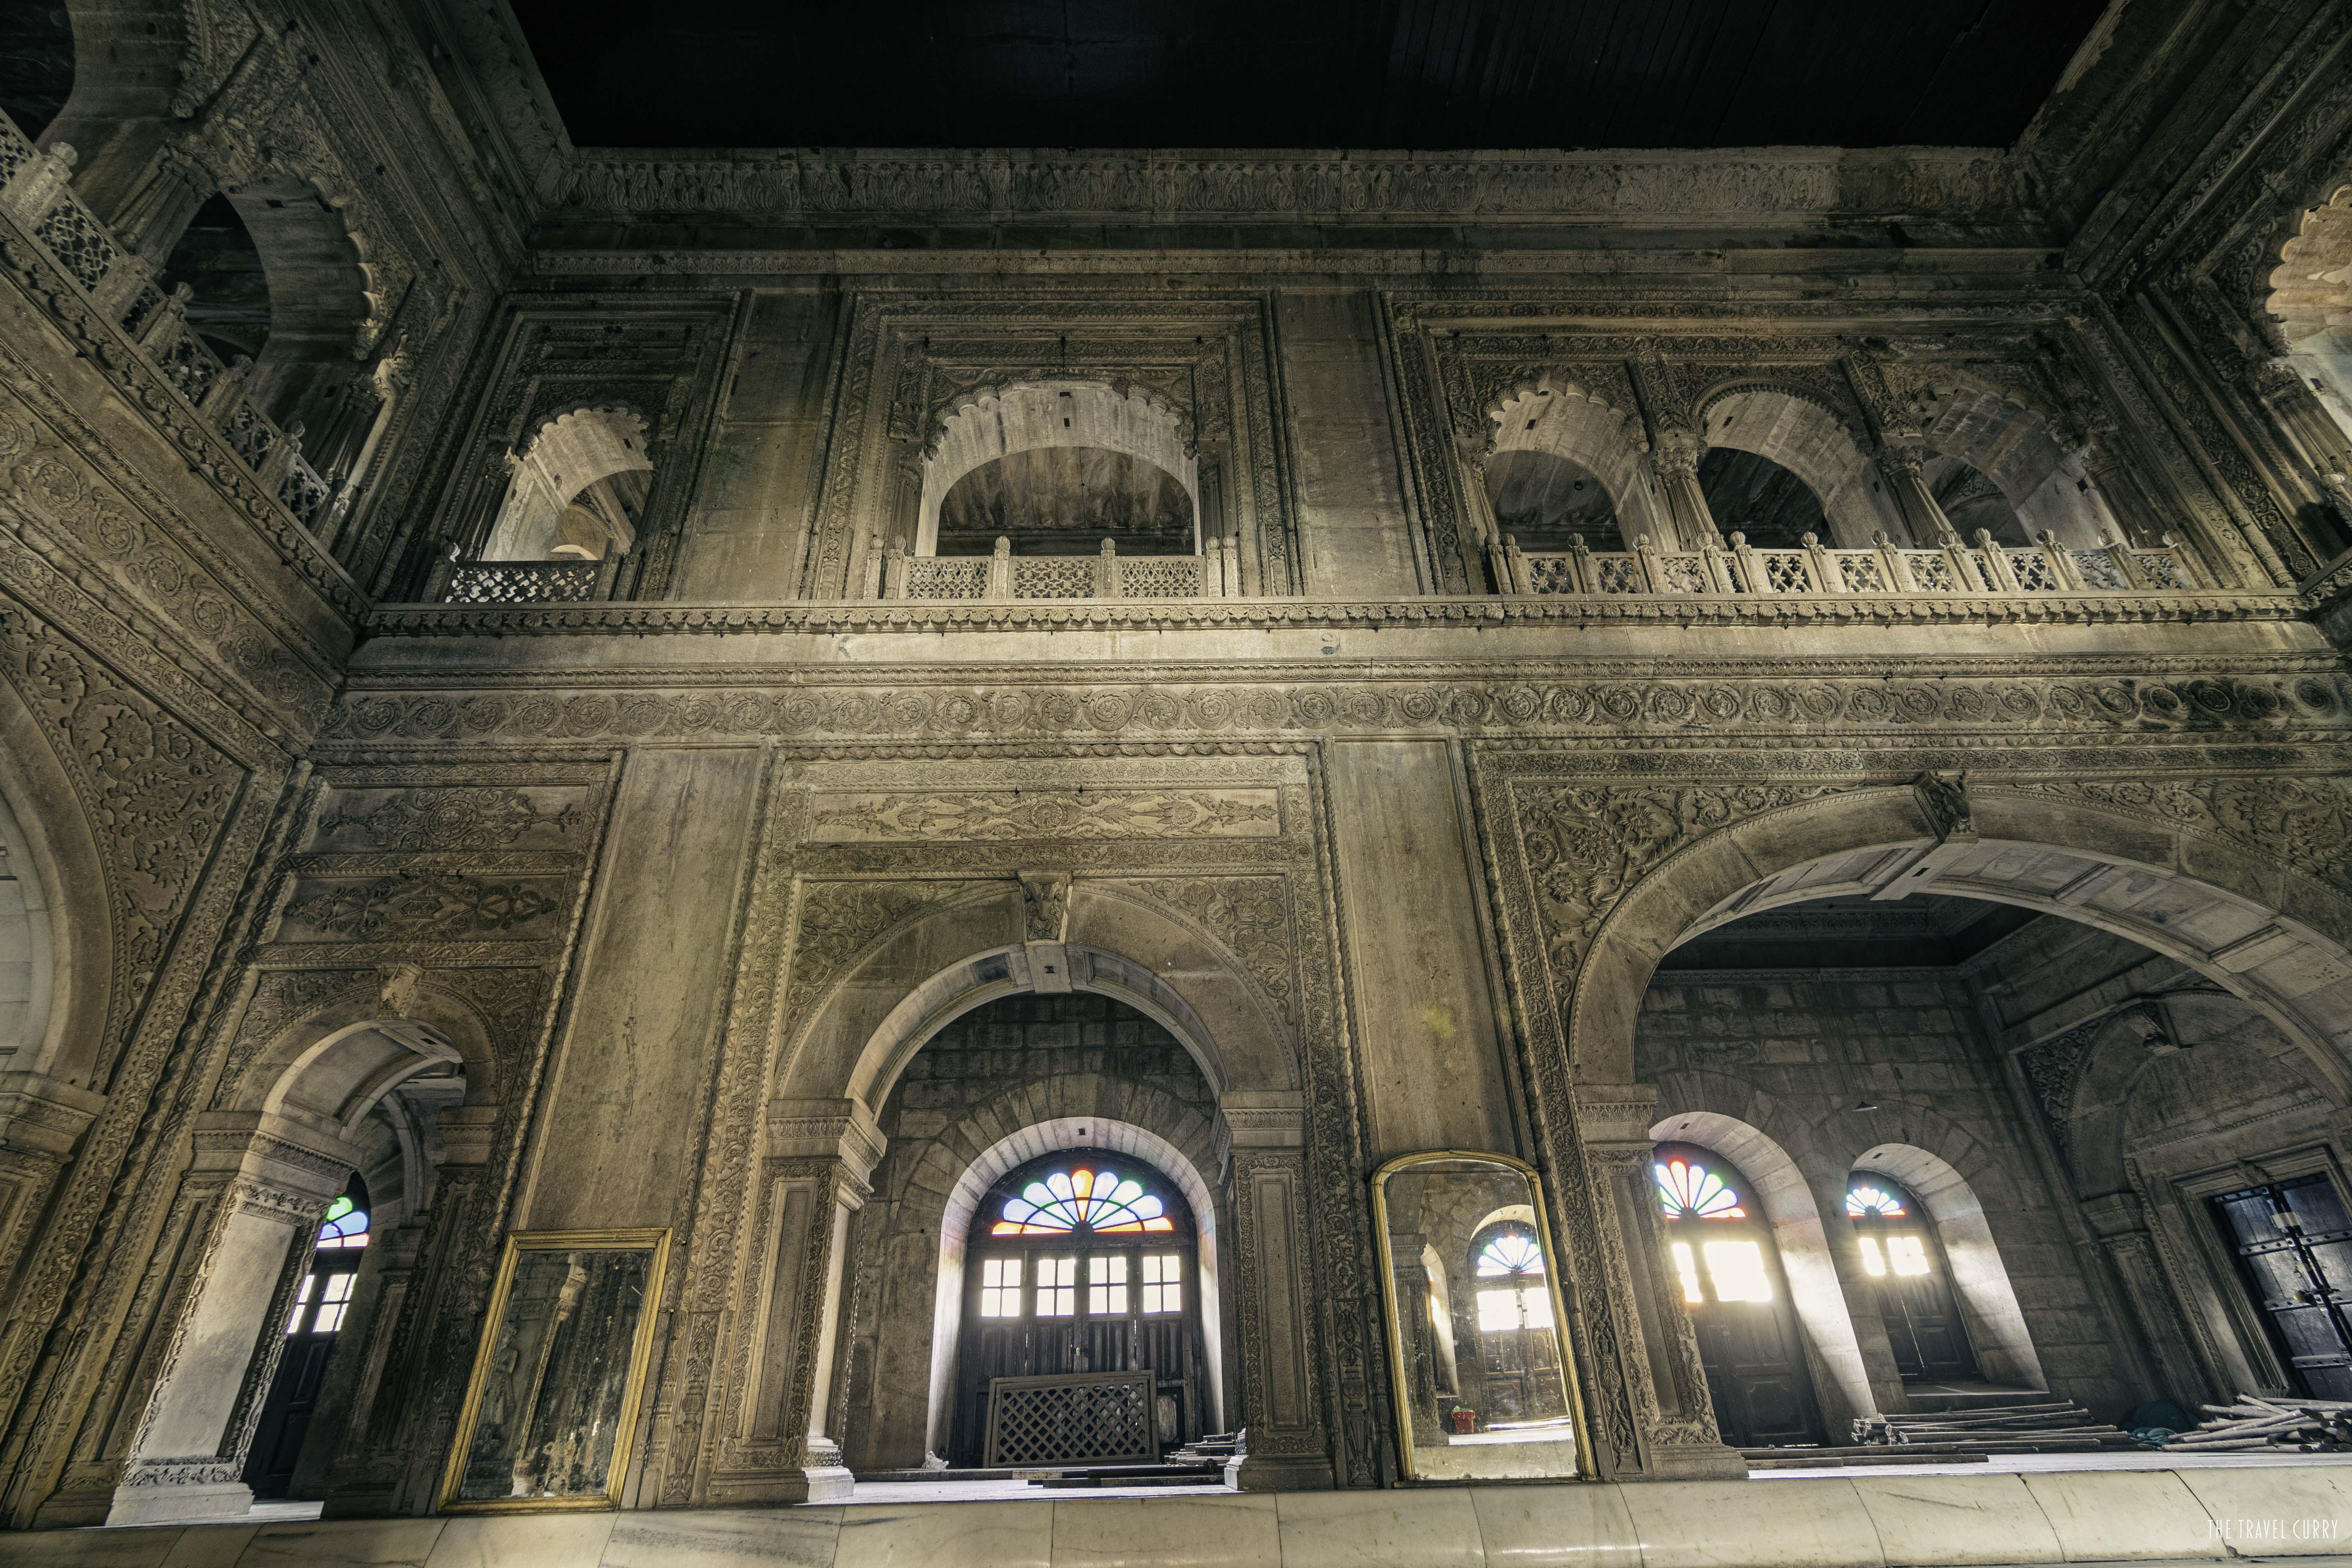 Scindia Ki Chhatri